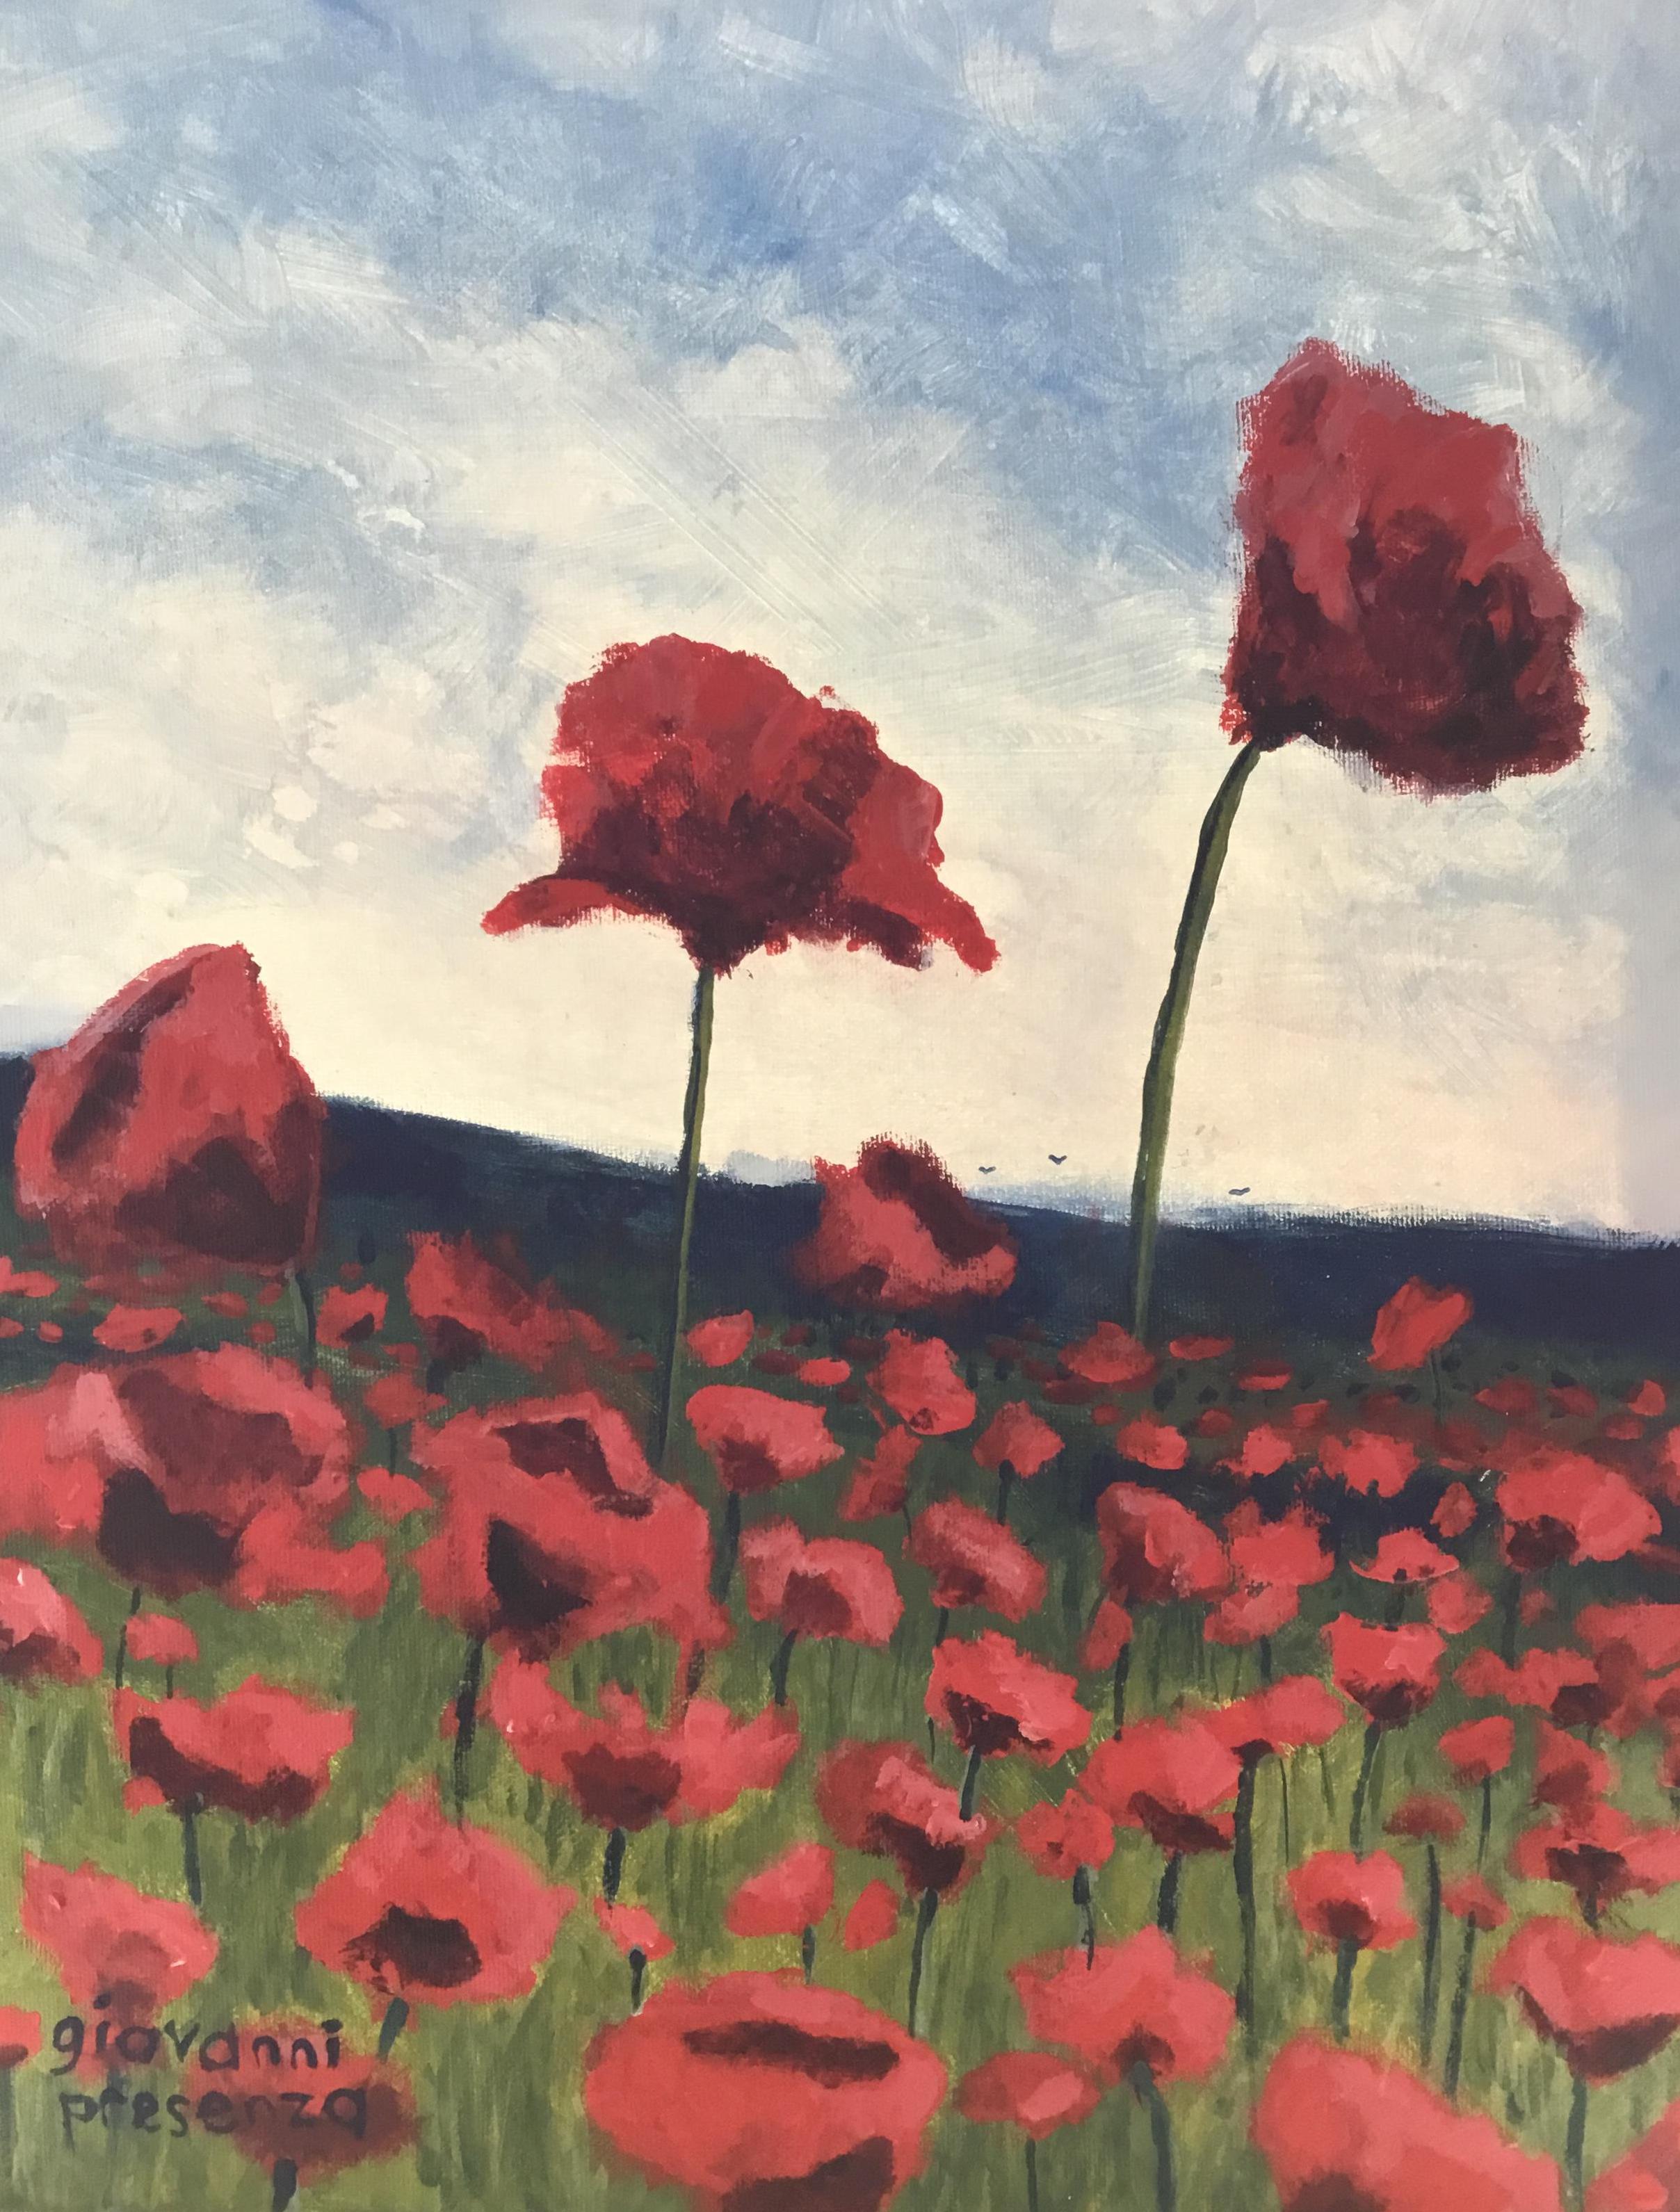 "Poppies, Acrylic on Canvas, 16x20"", unframed"